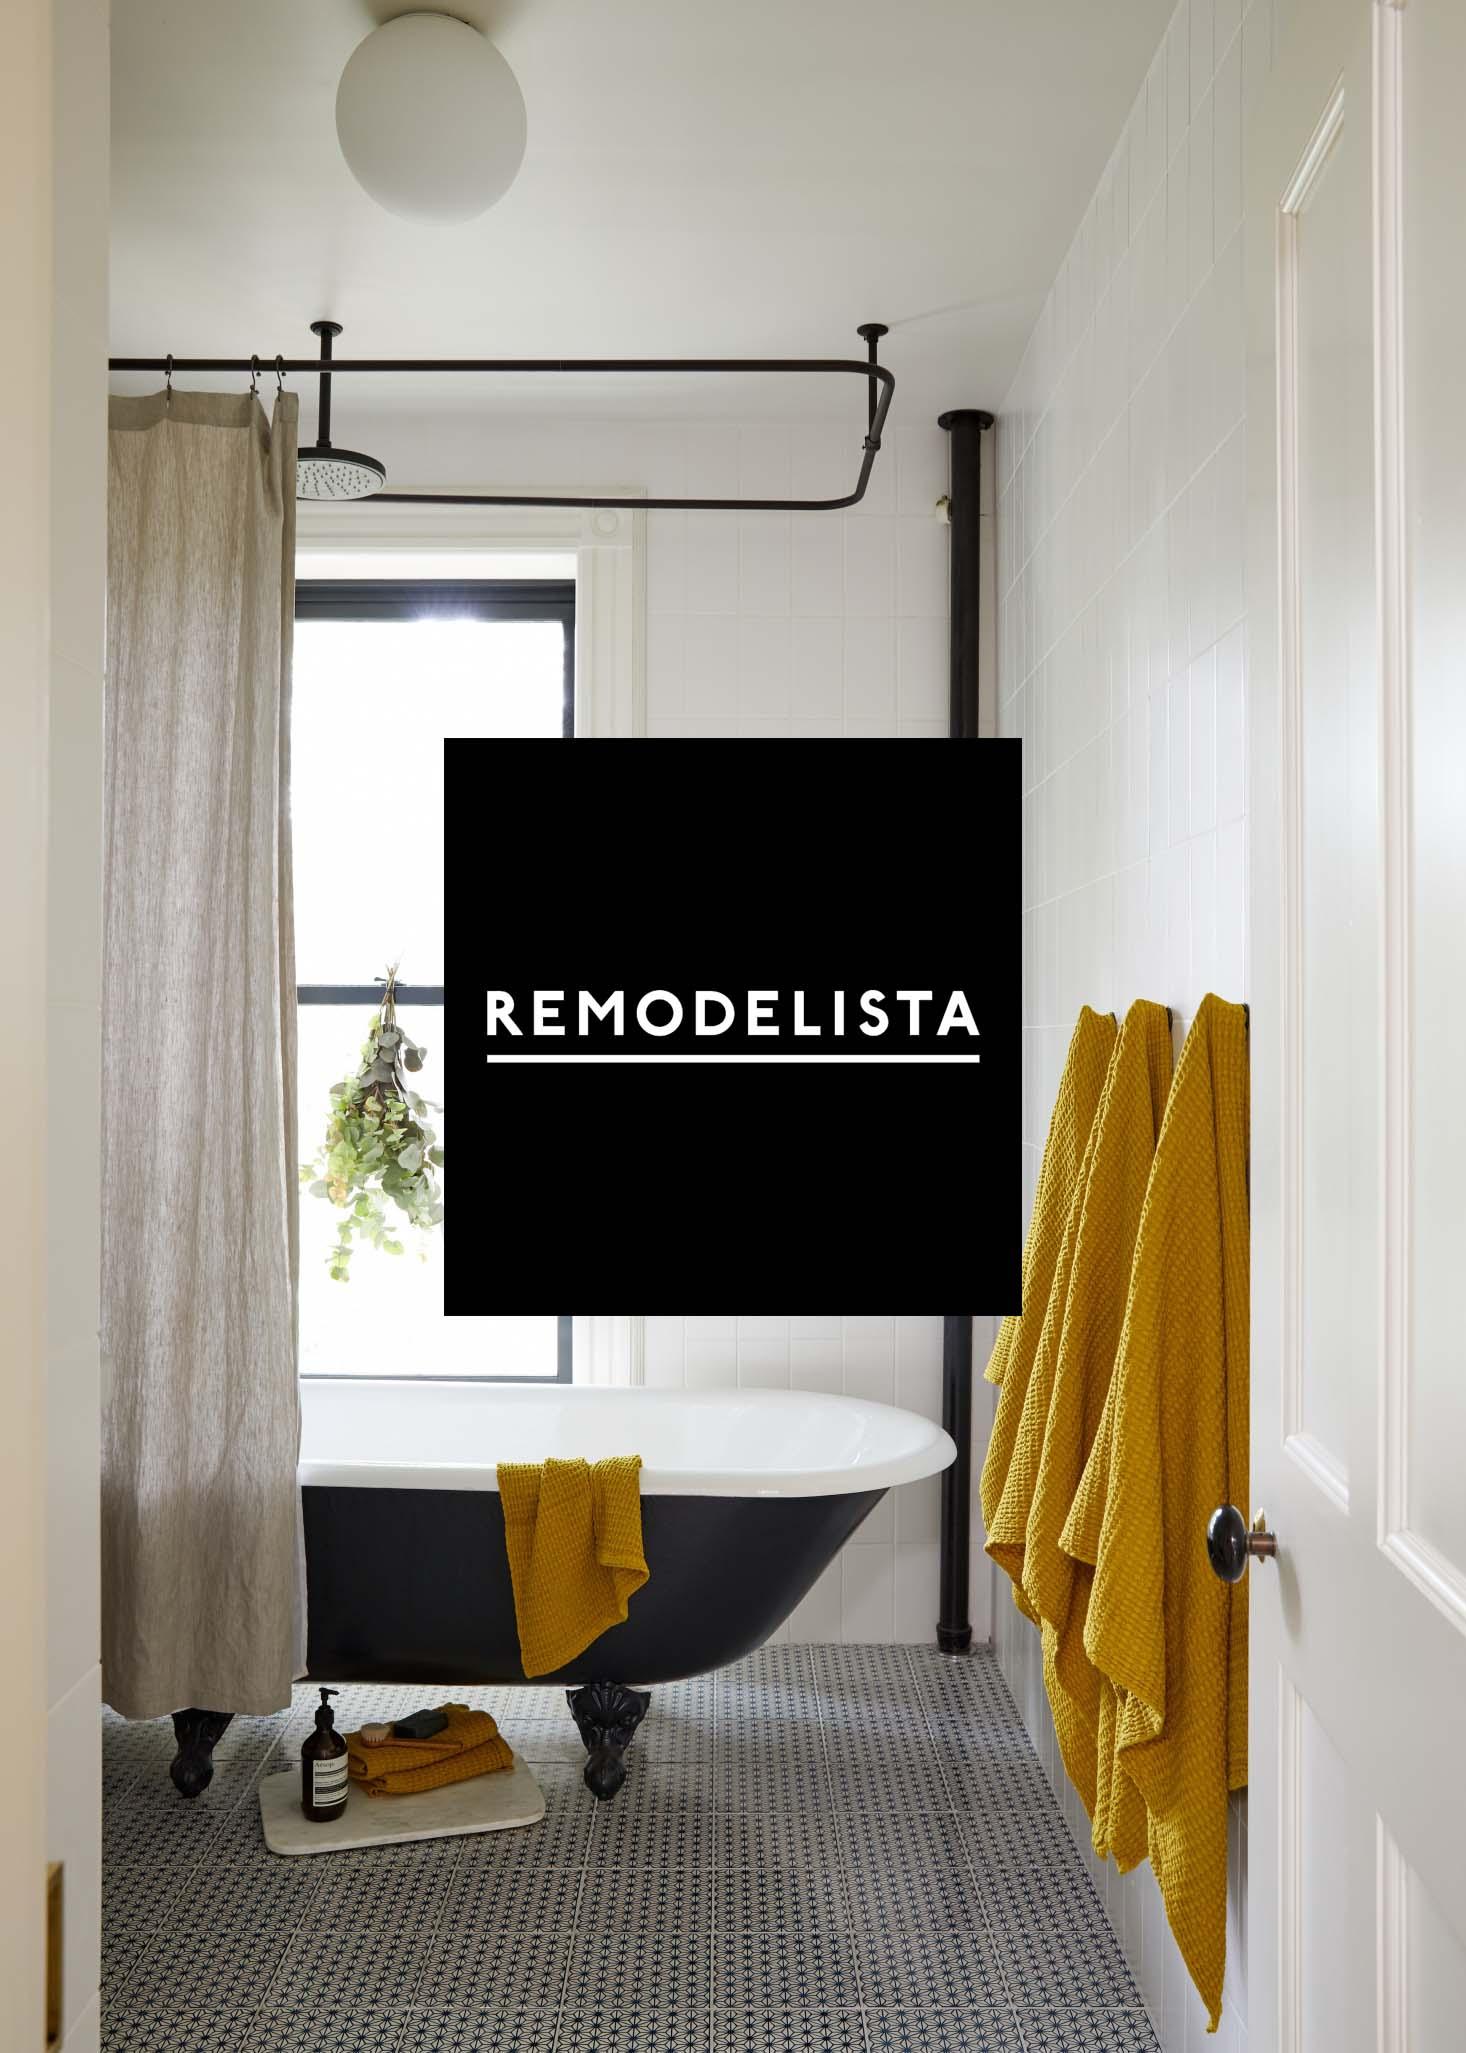 REMODELISTA - THE SENTIMENTAL MINIMALIST, 2018